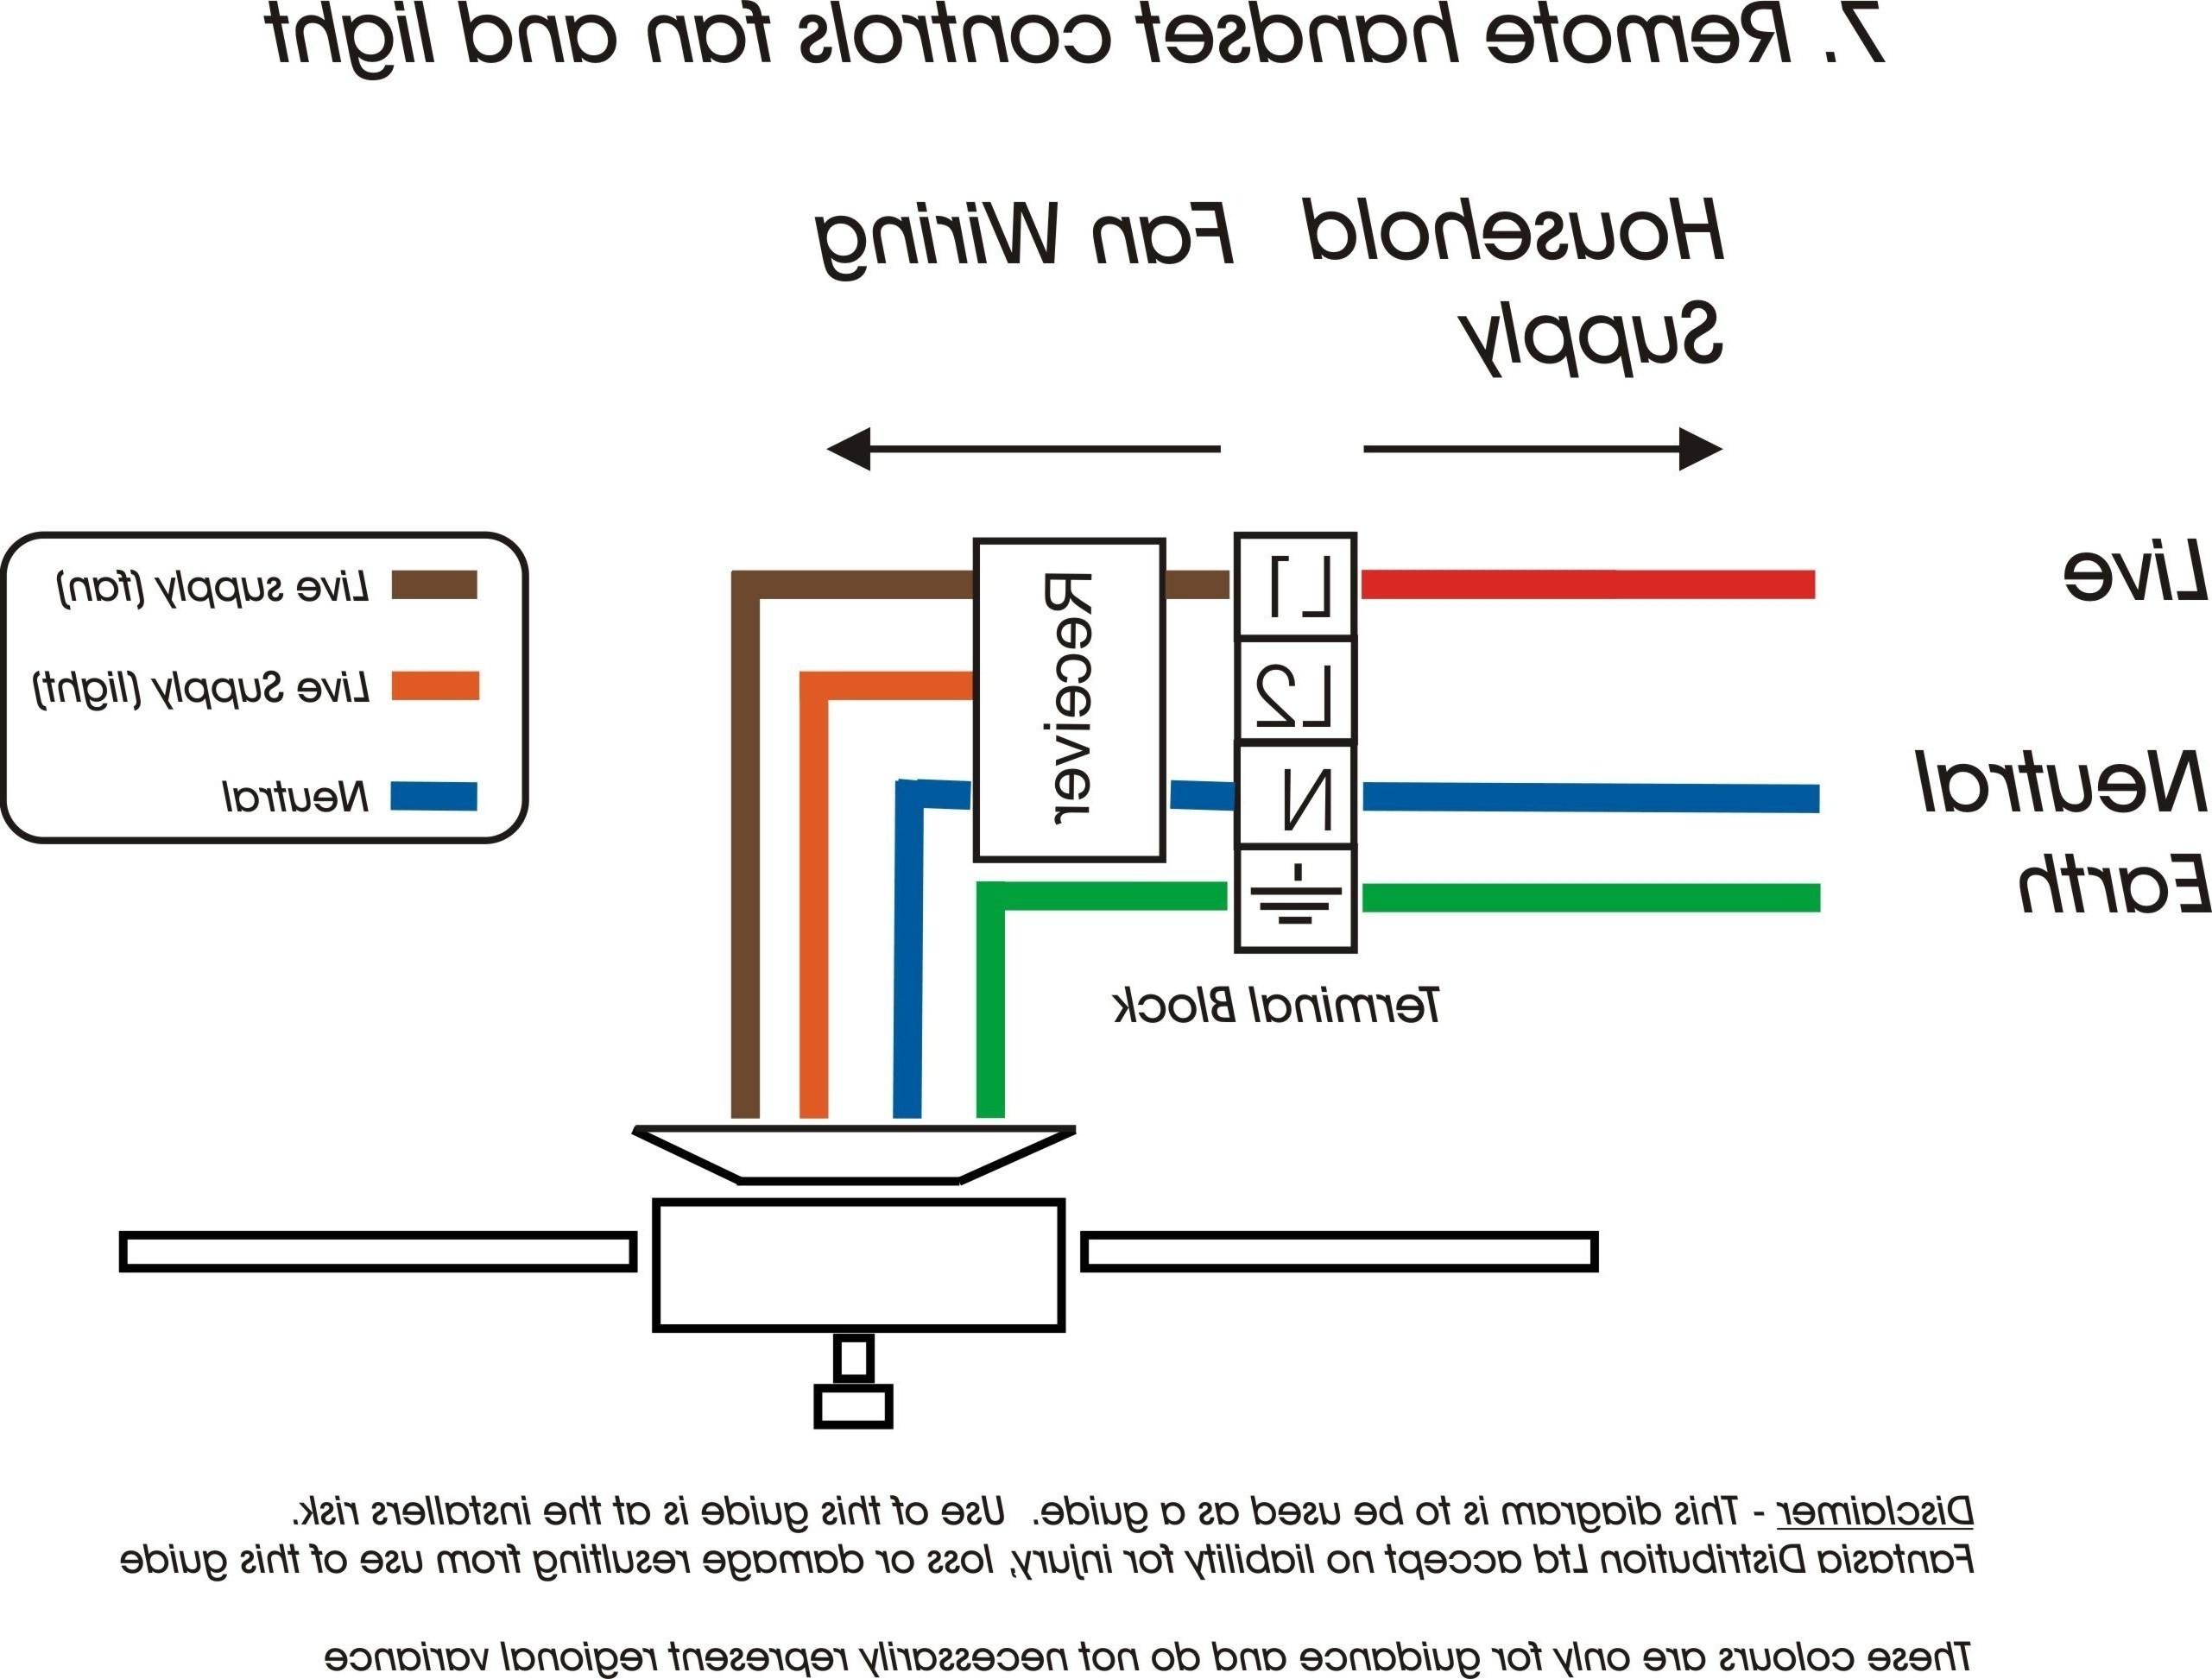 Passtime Gps Wiring Diagram Lutron Maestro Wiring Diagram Of Passtime Gps Wiring Diagram